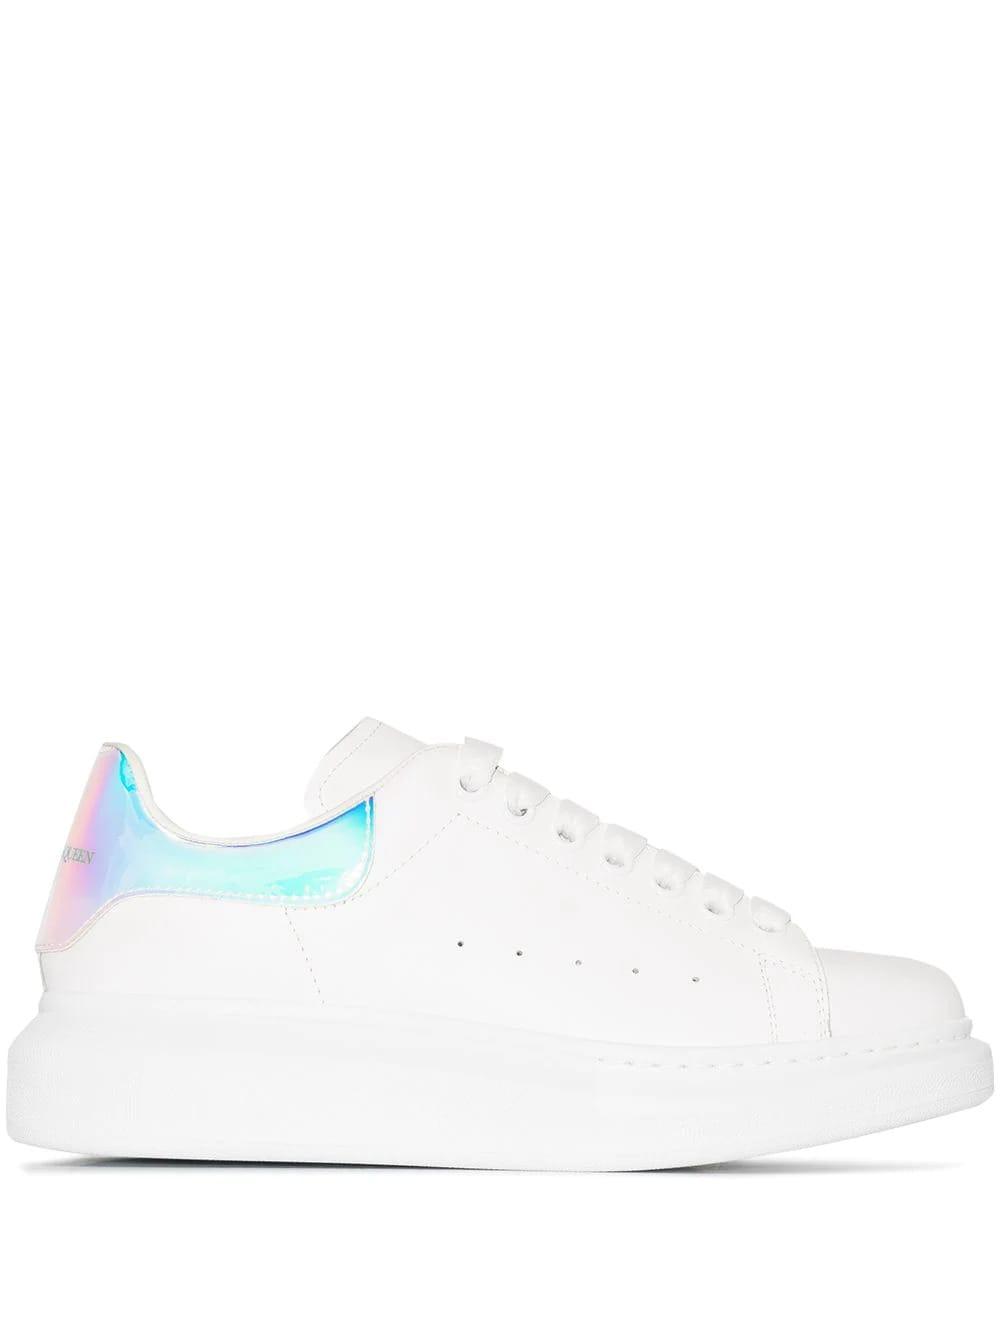 Alexander McQueen Woman White Oversize Sneakers With Iridescent Spoiler